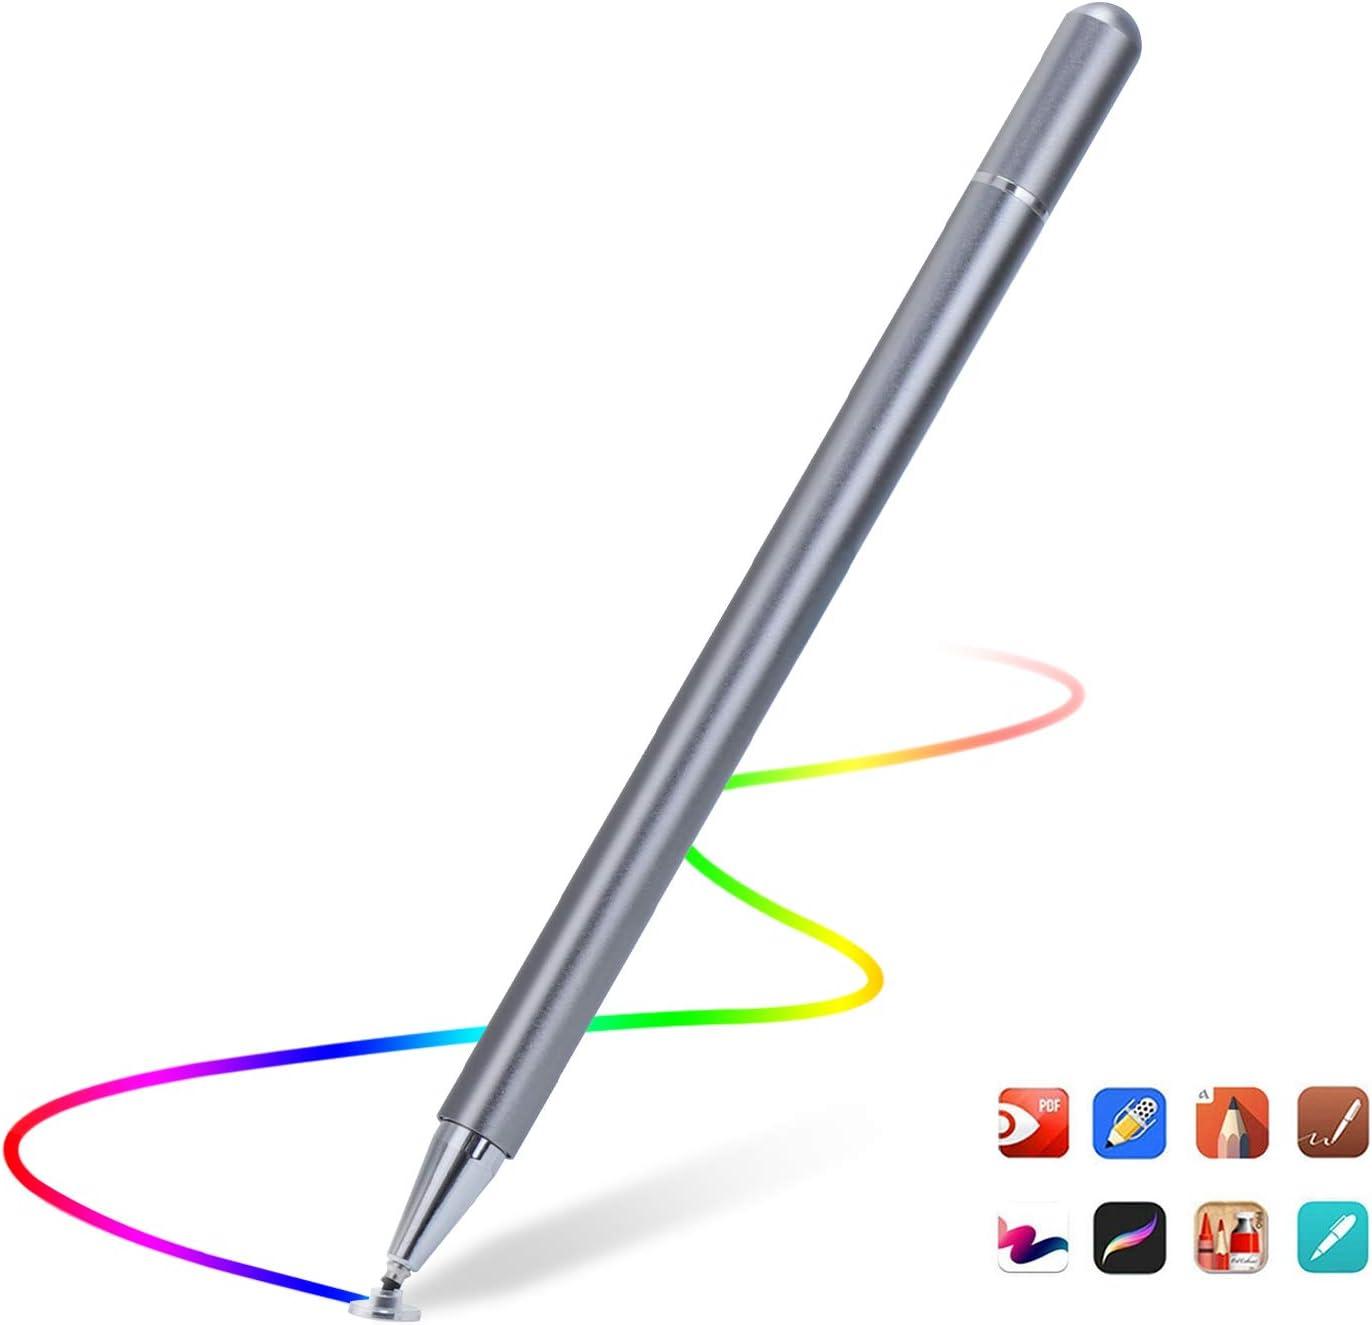 Lapiz Stylus Pen Capacitivo Para Pantallas Tactiles. Gris.